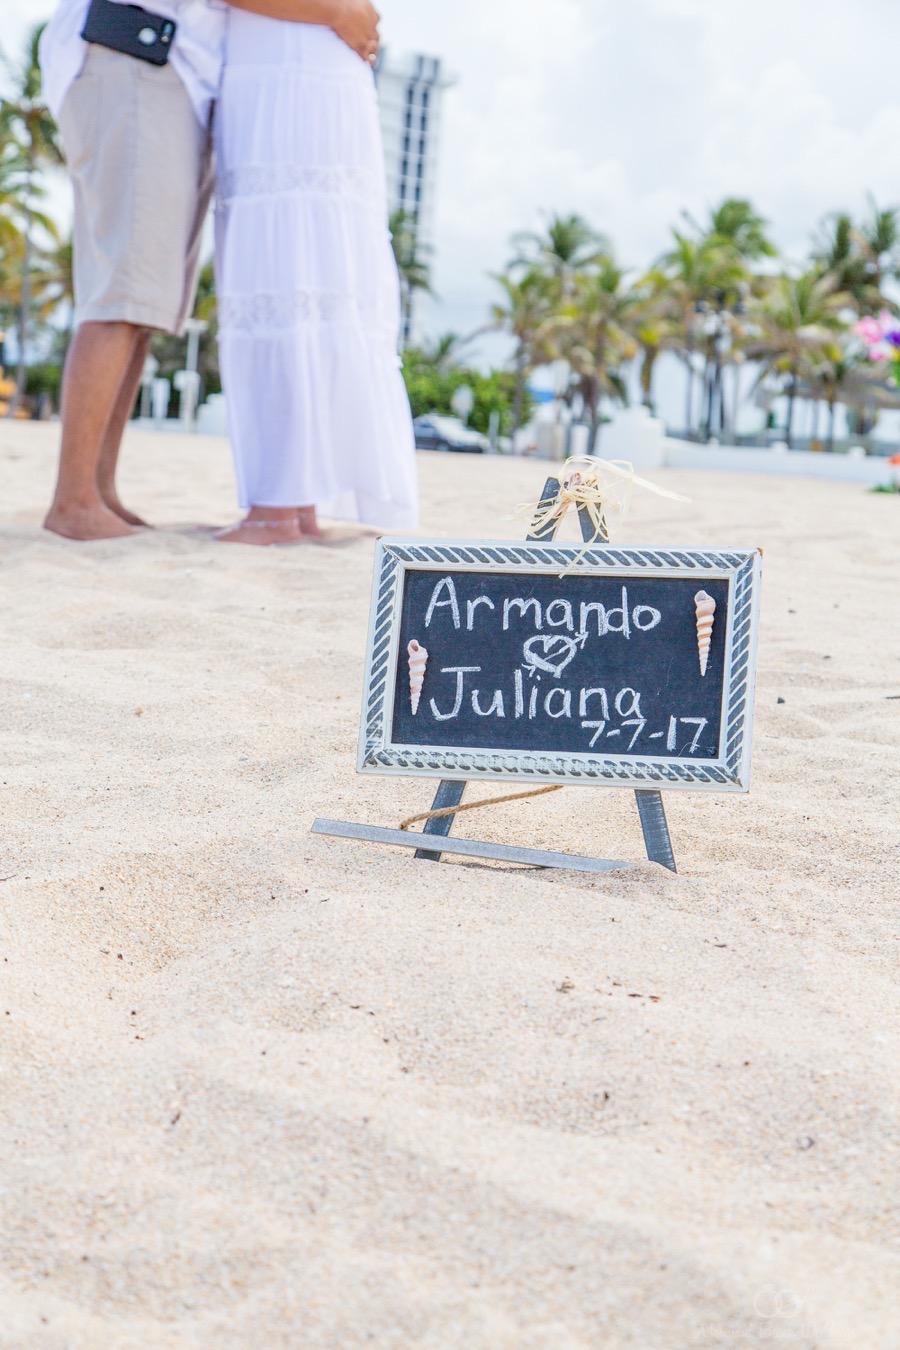 7-7-17 Armando & Juliana_68